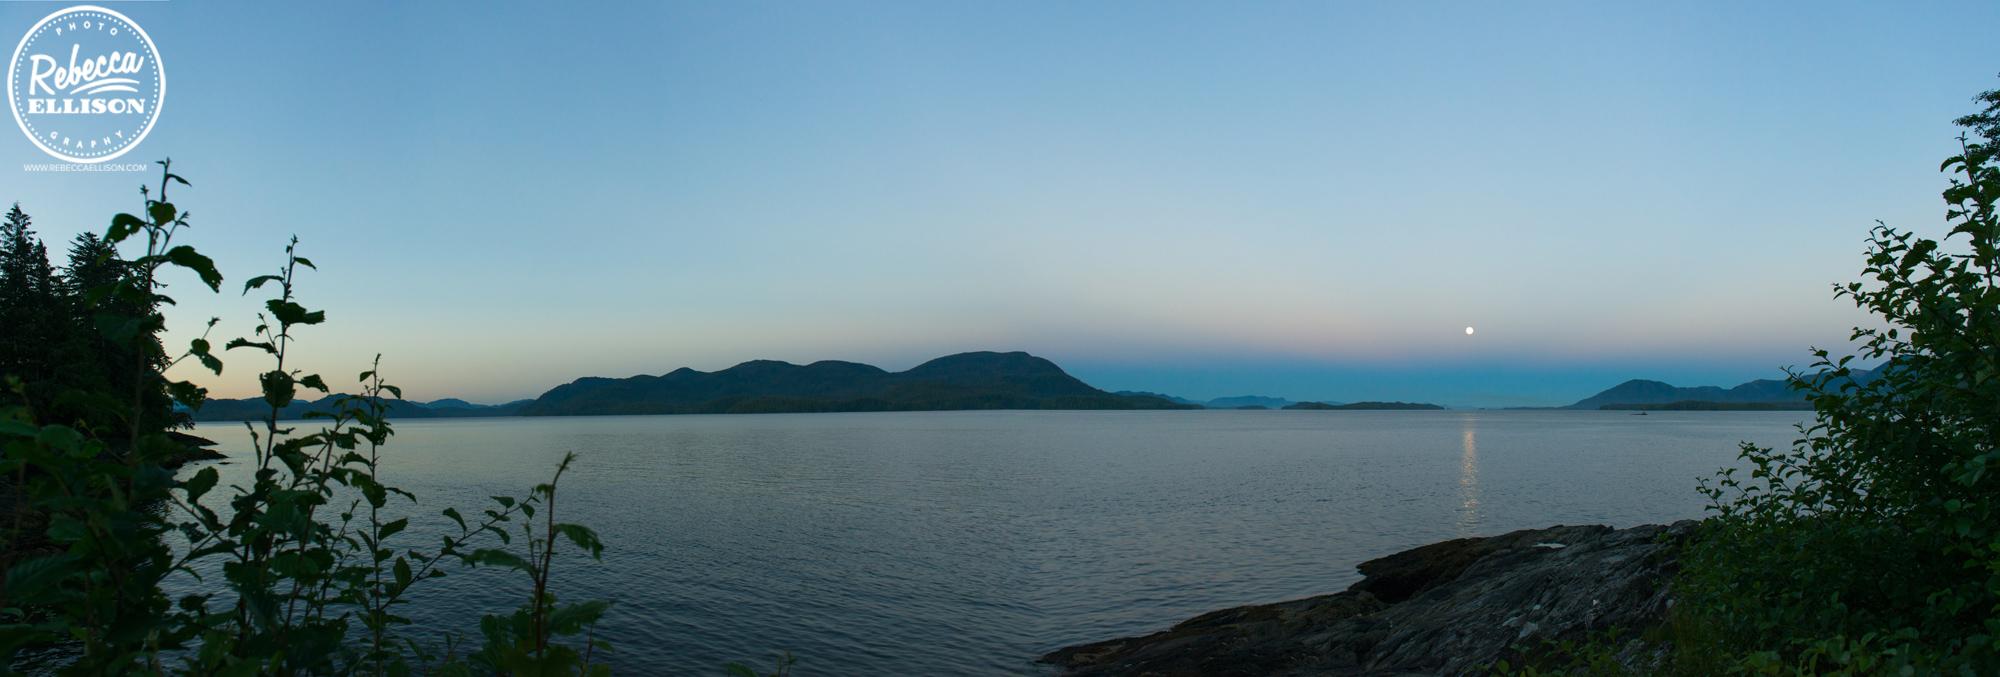 Sunrise in Ketchikan Alaska photographed bt Rebecca Ellison Photography